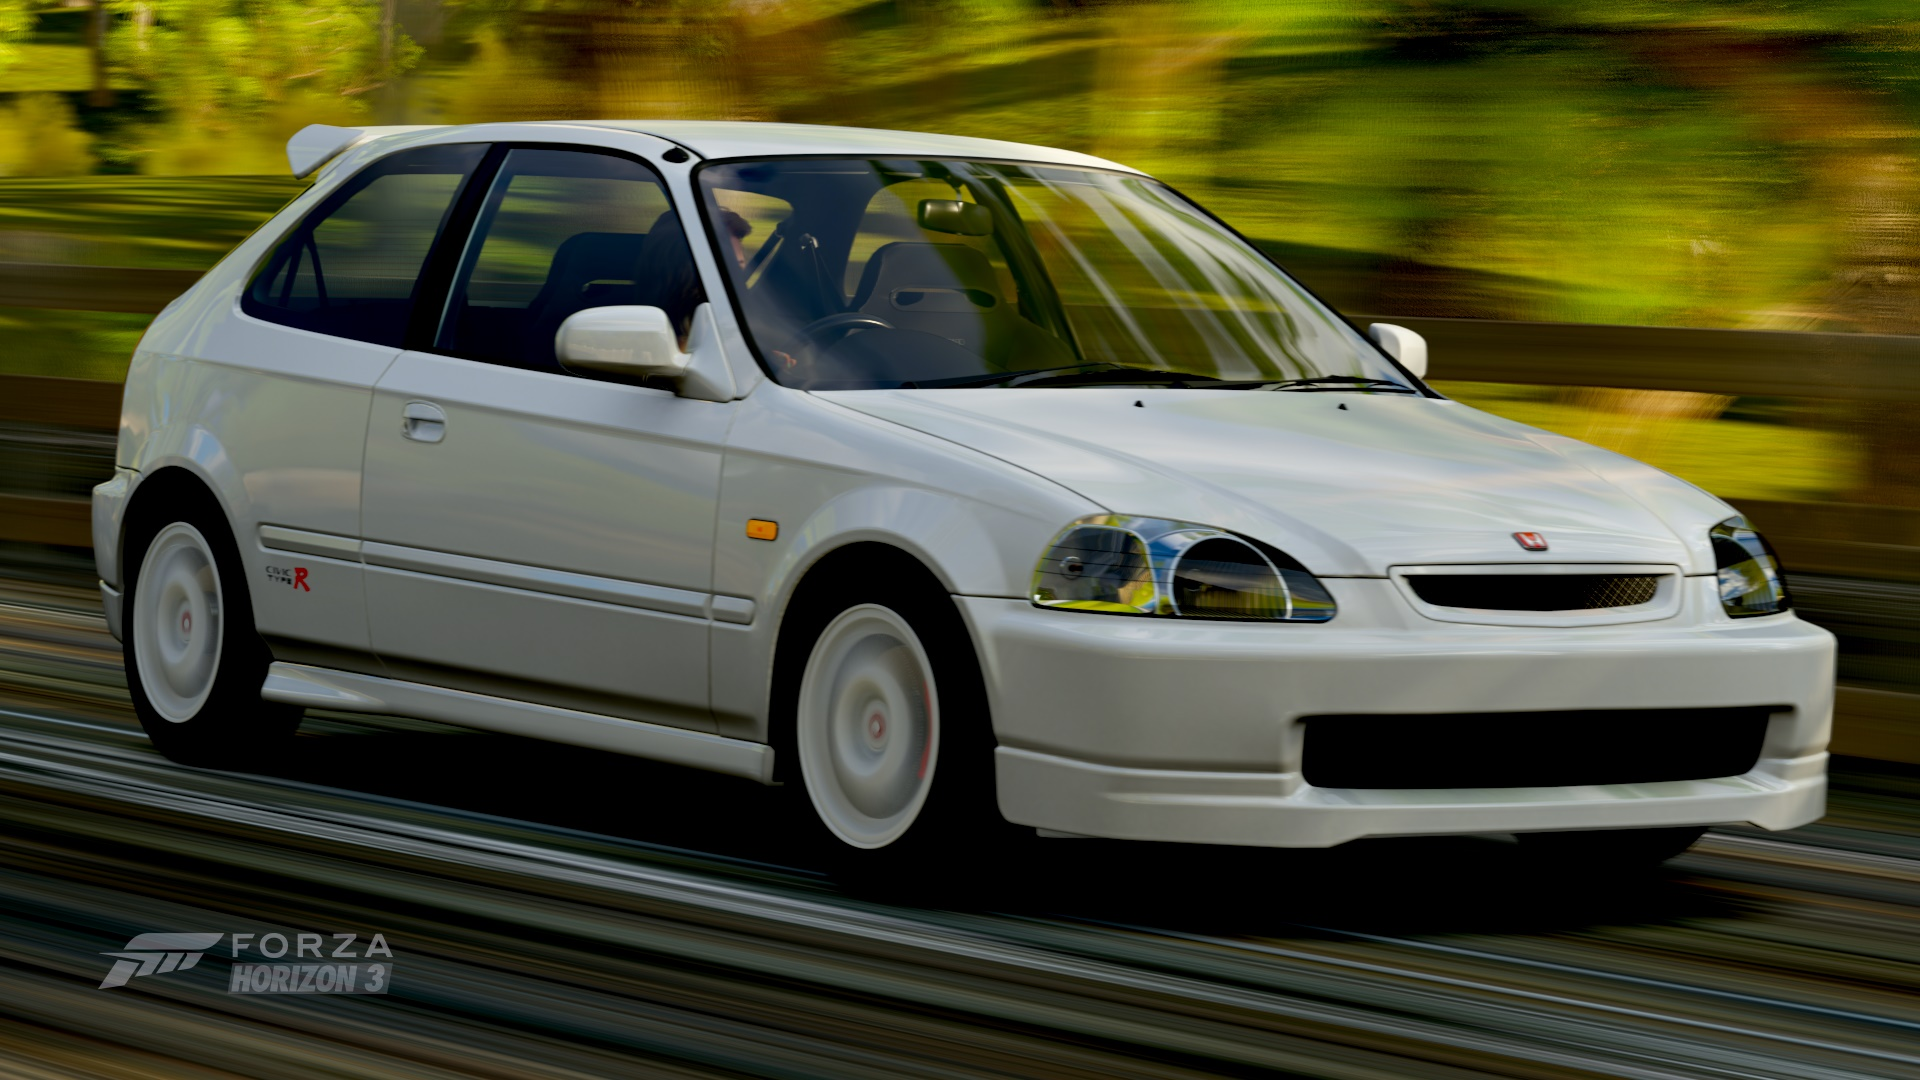 1997 Honda Civic Type R